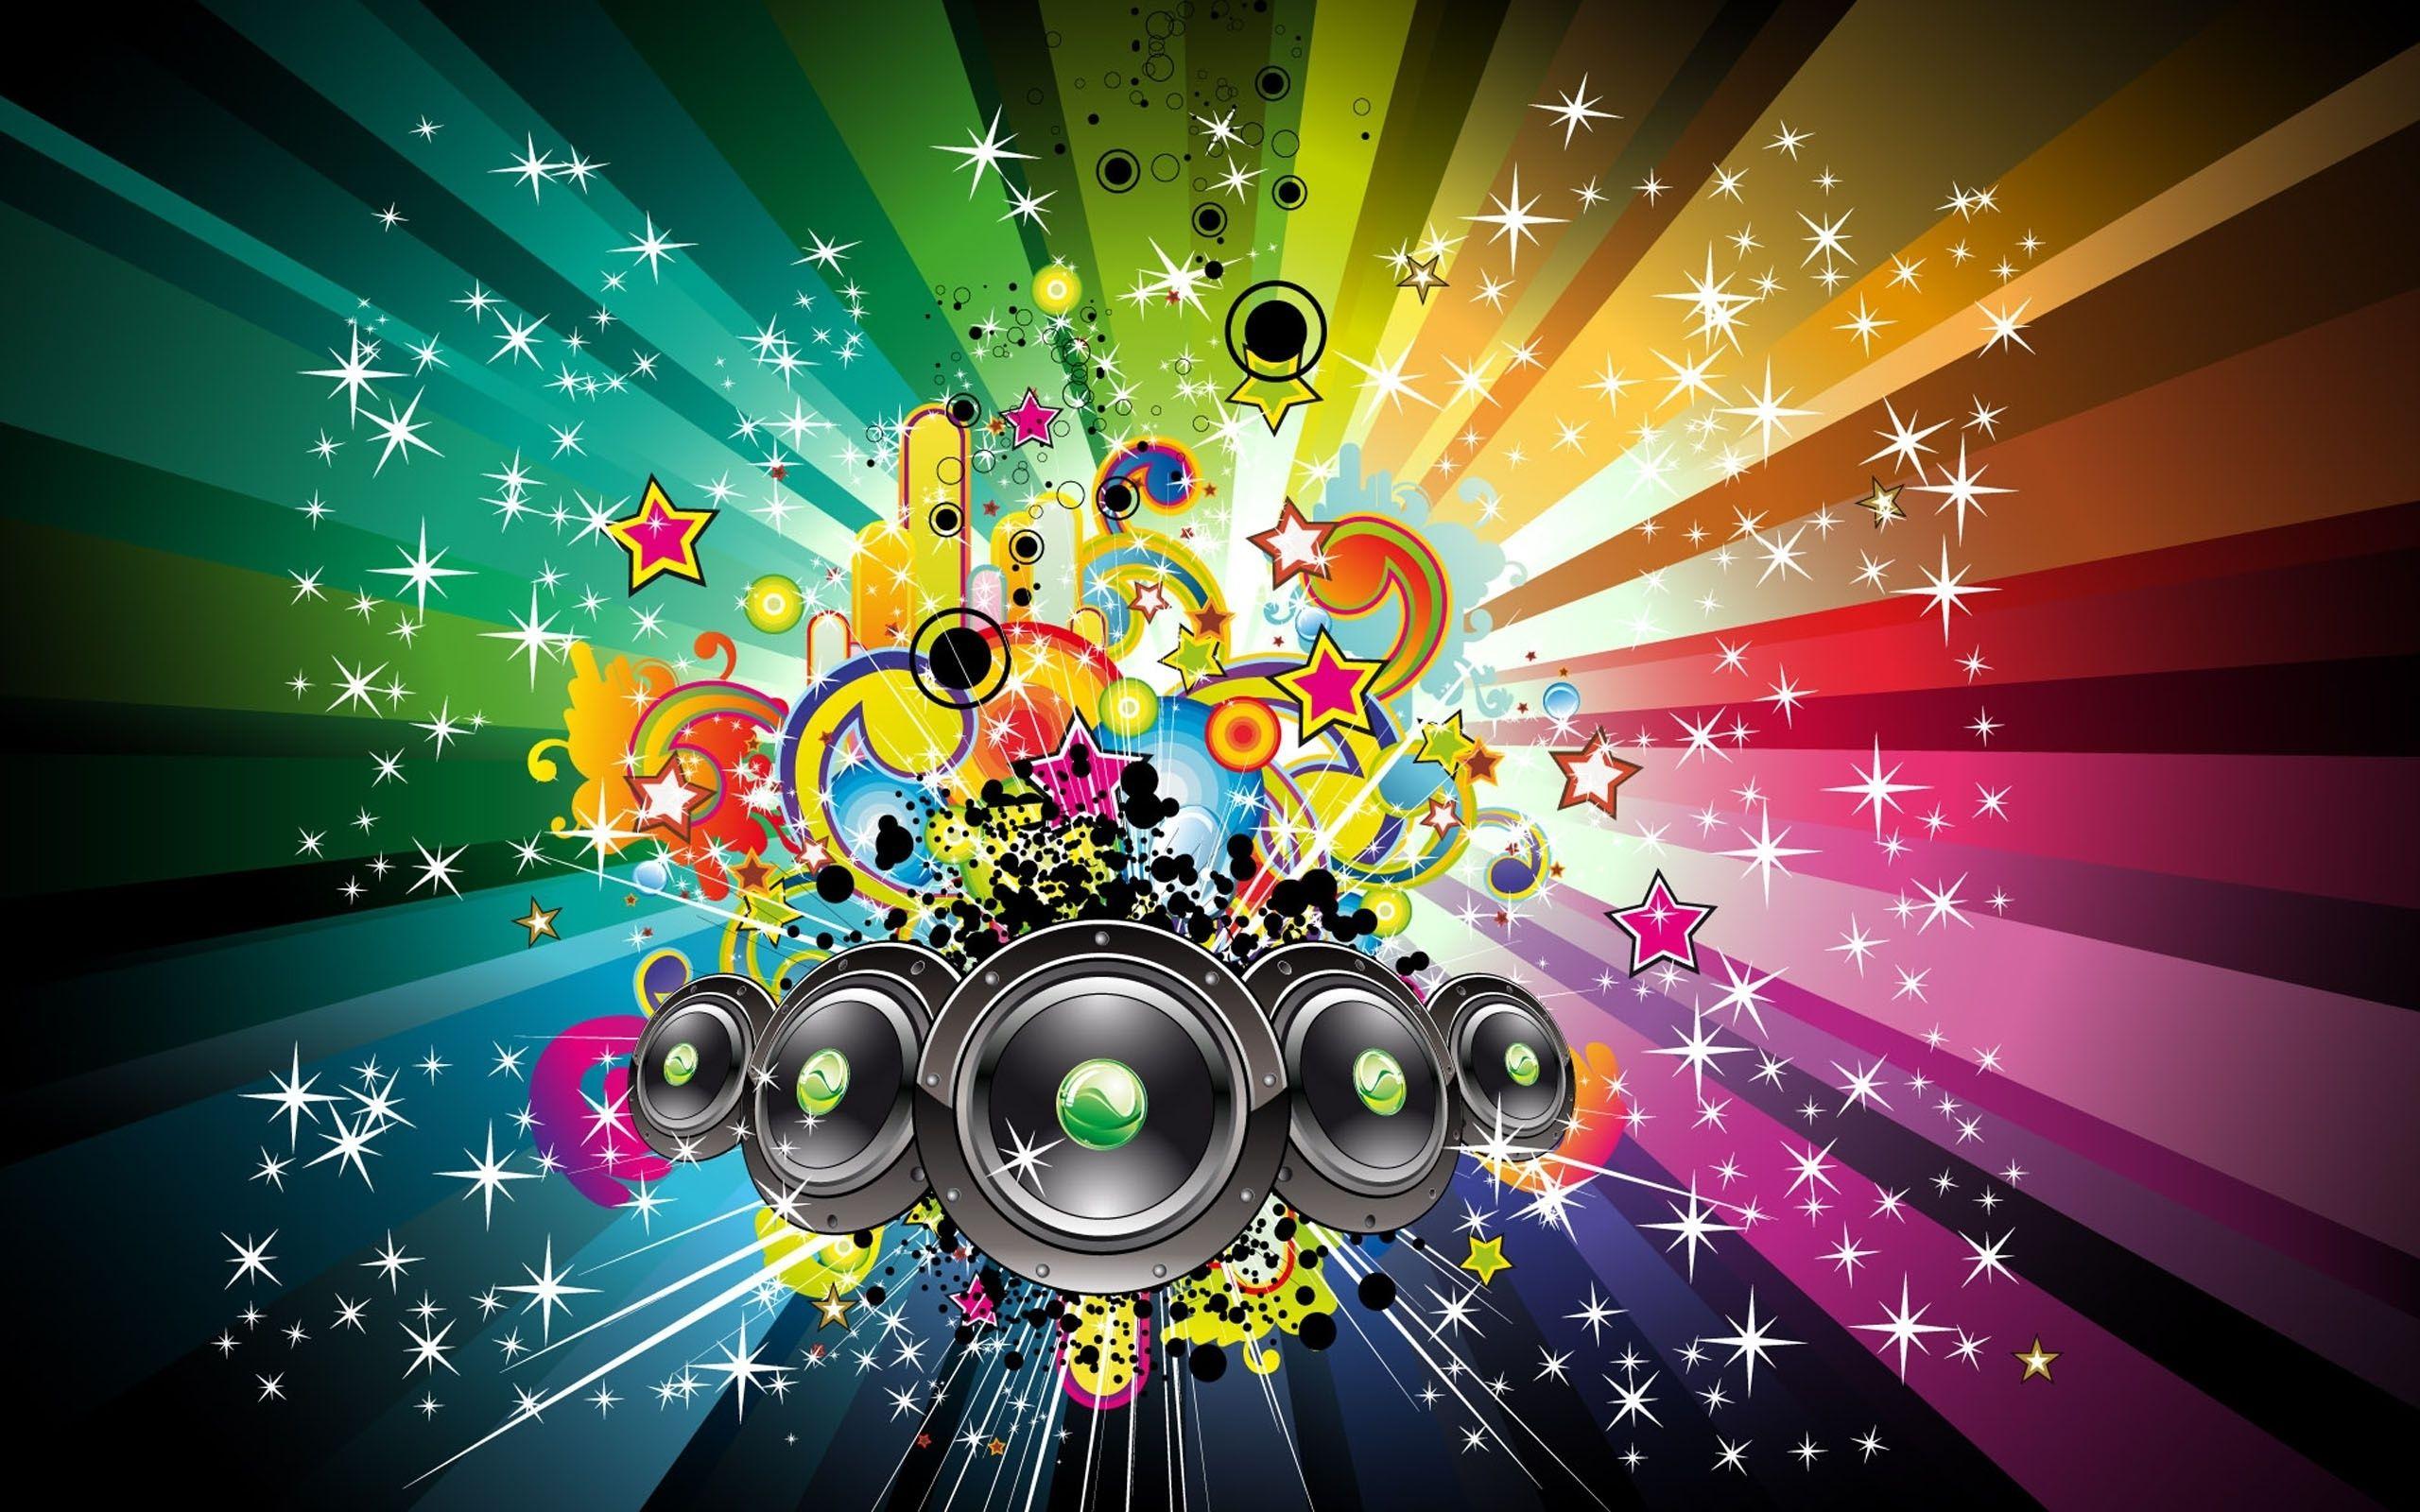 Speakers Wallpapers 6766 Hd Wallpapers Music Wallpaper 3d Wallpaper Music Music Backgrounds